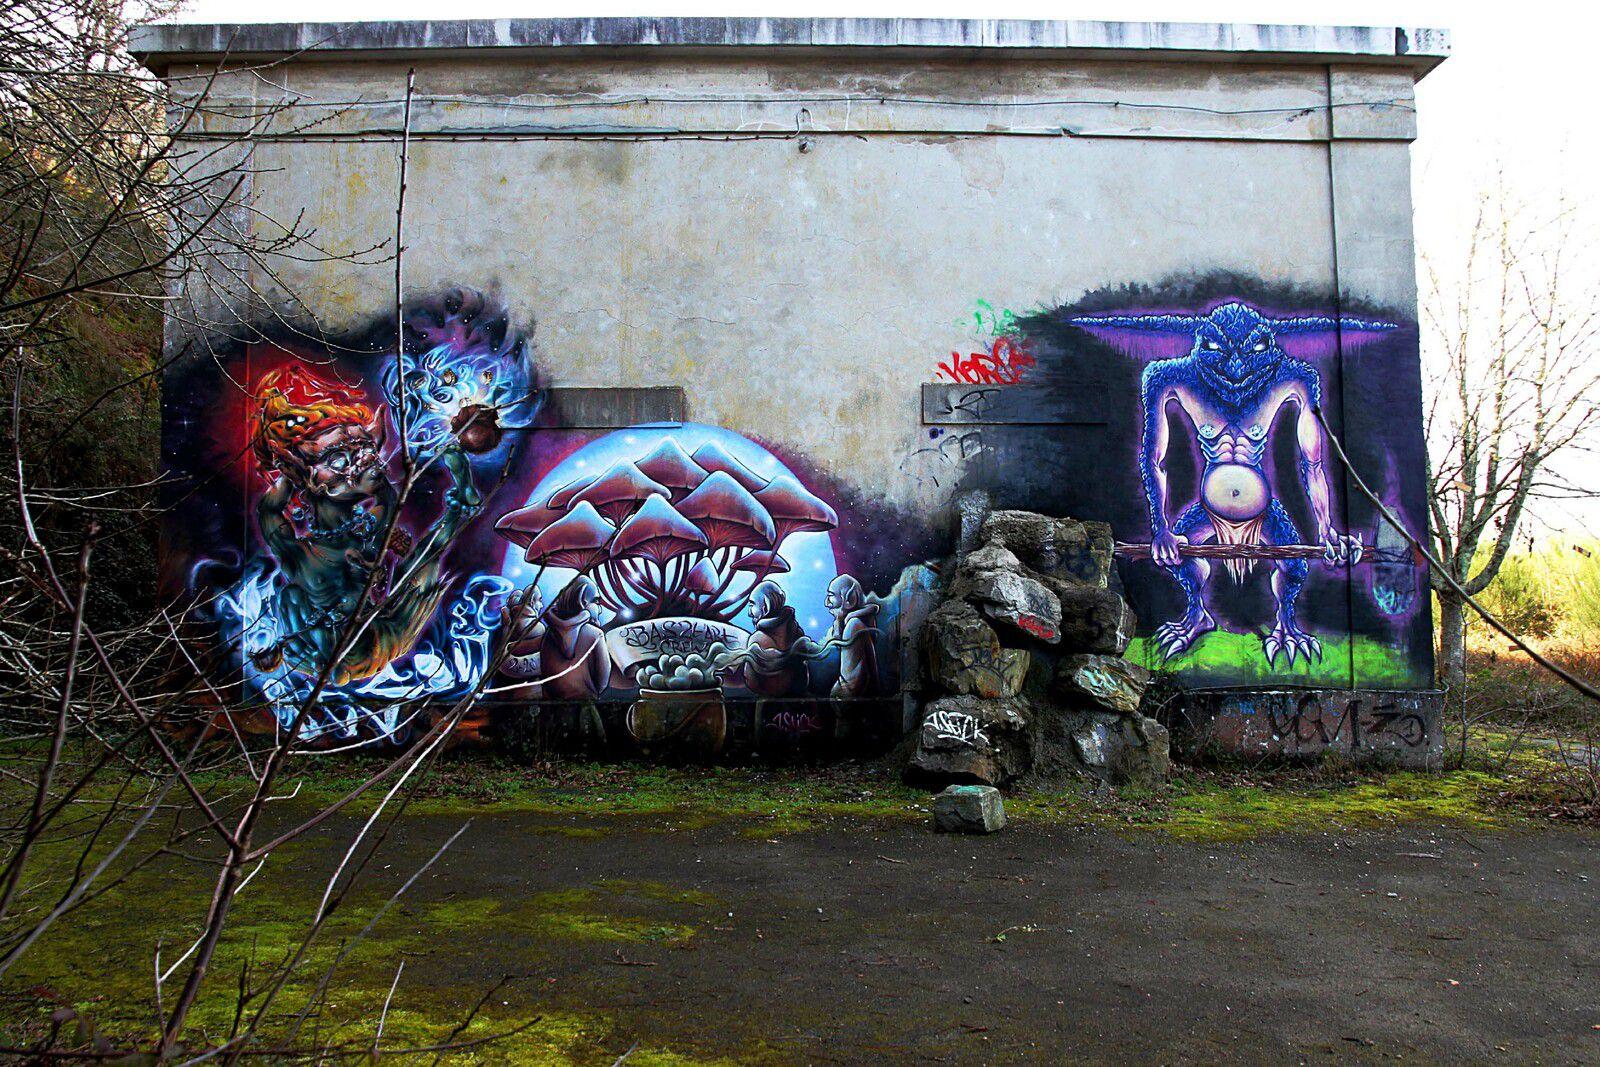 Graffiti à la Poudrière - Mercredi 24 février 2021